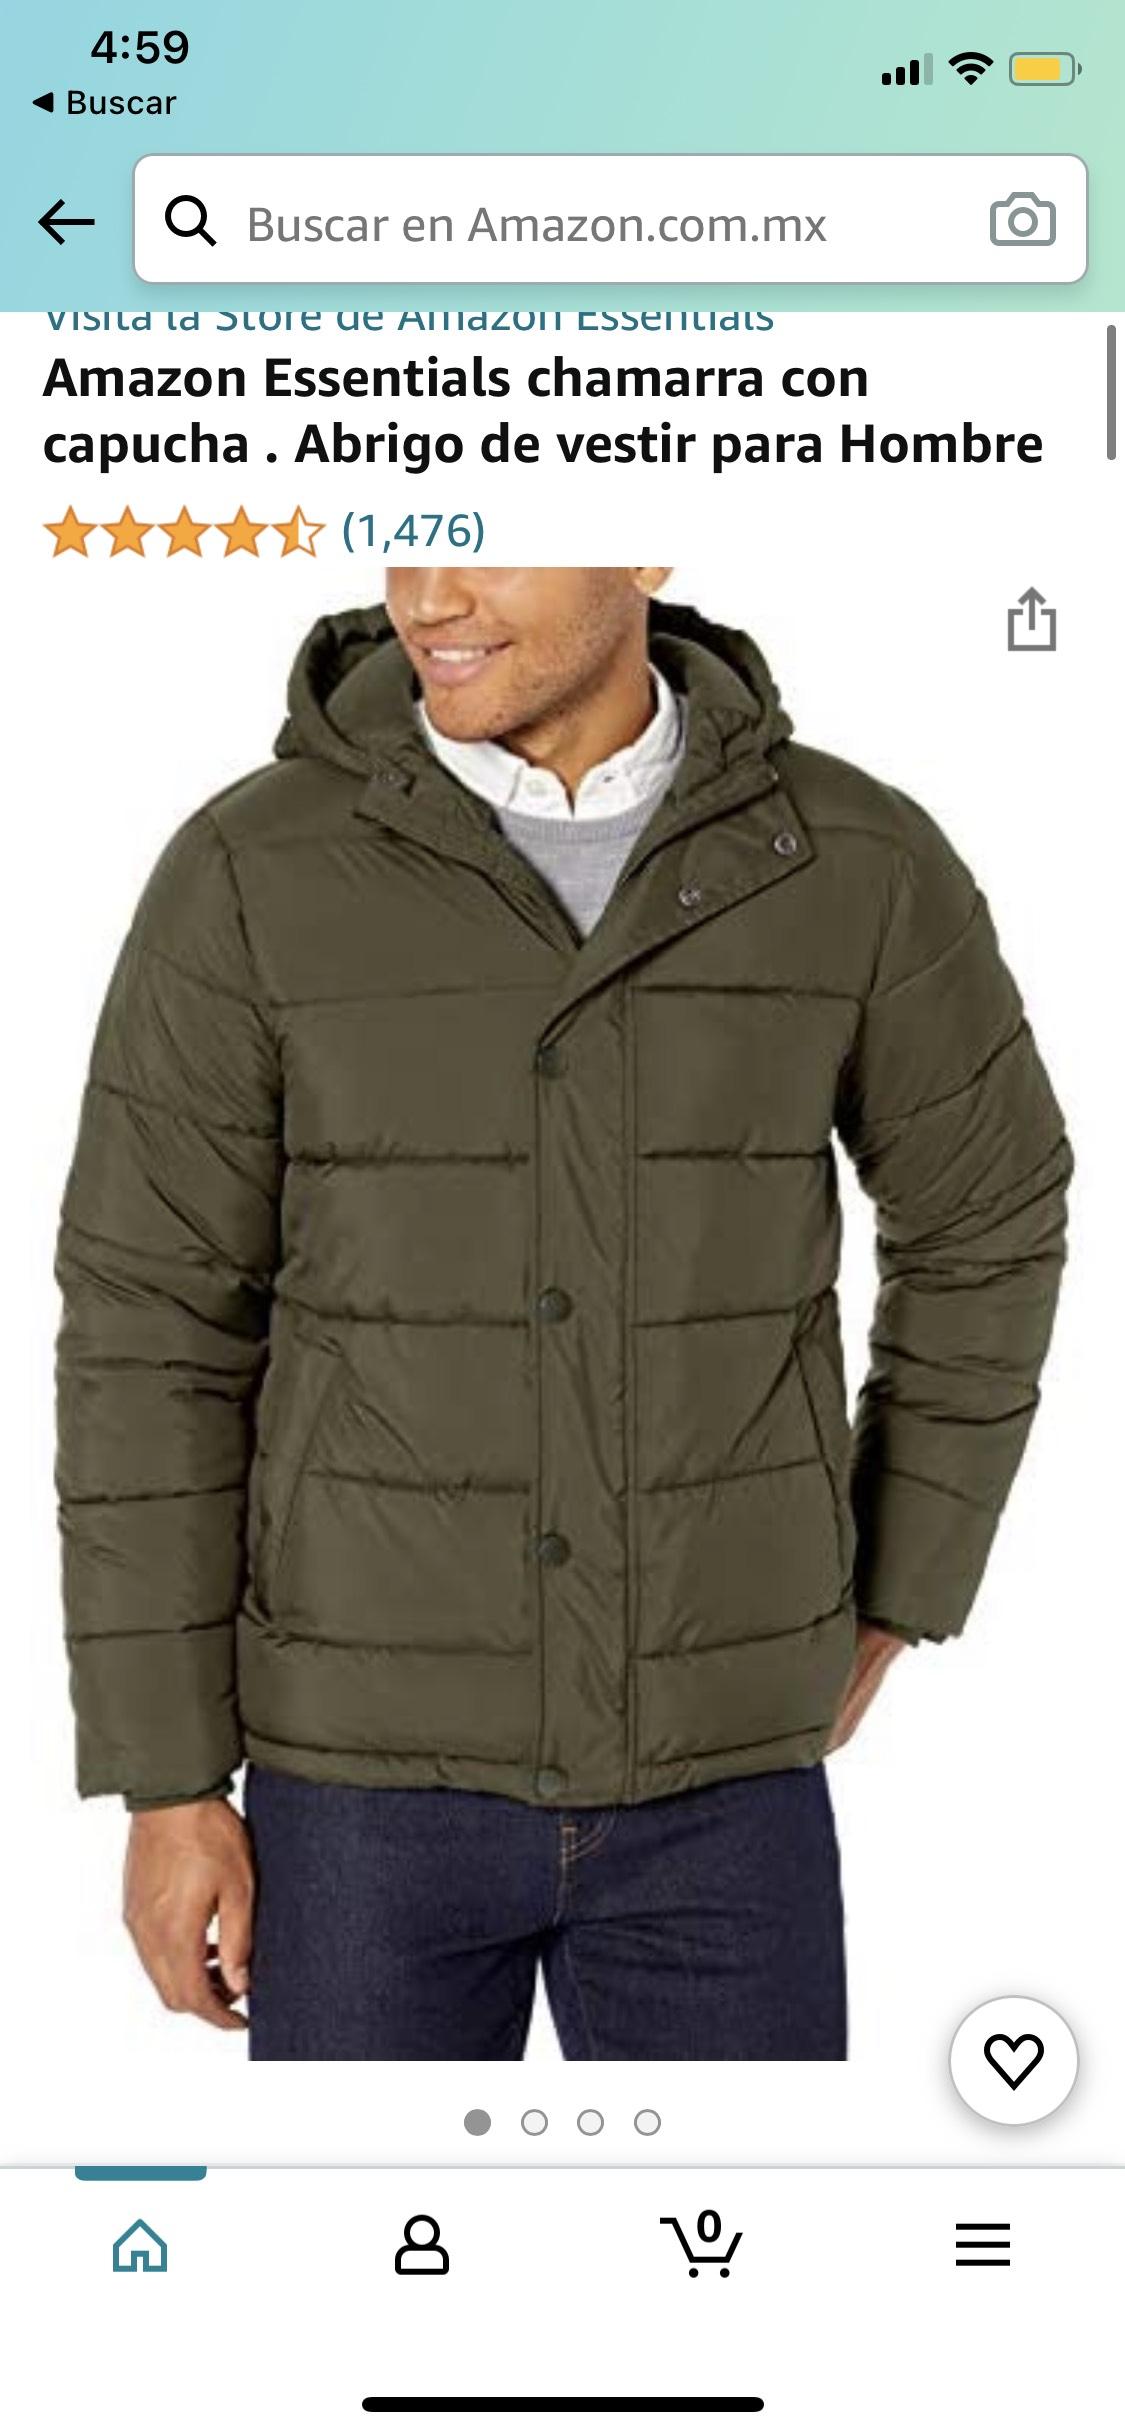 Amazon Essentials chamarra con capucha . Abrigo de vestir para Hombre